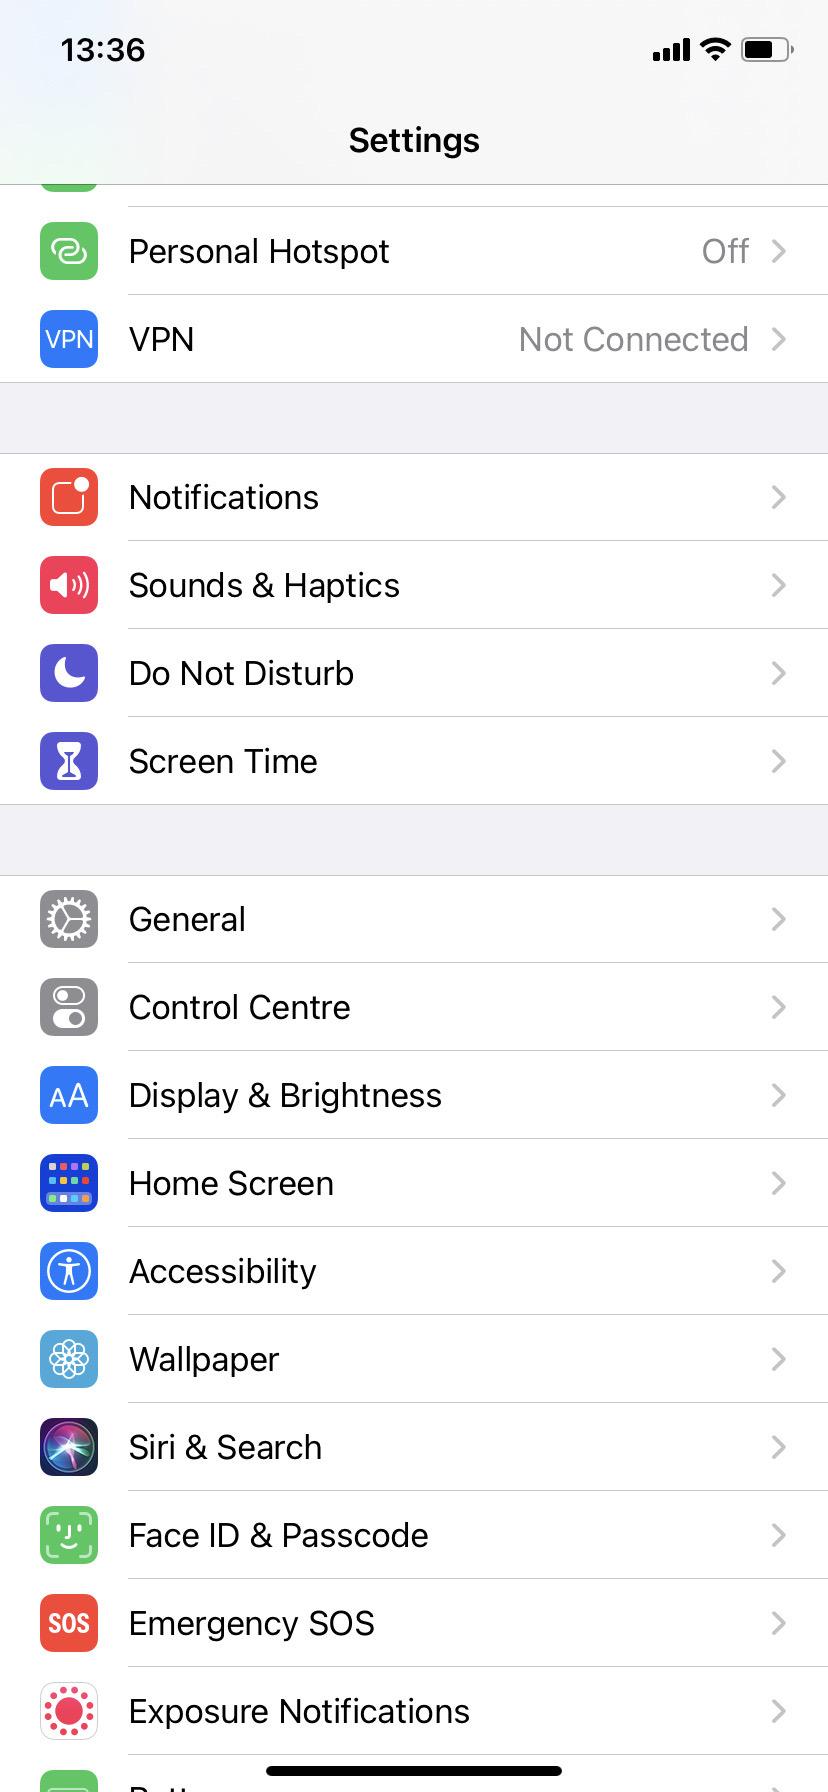 Adjust your settings on iOS14